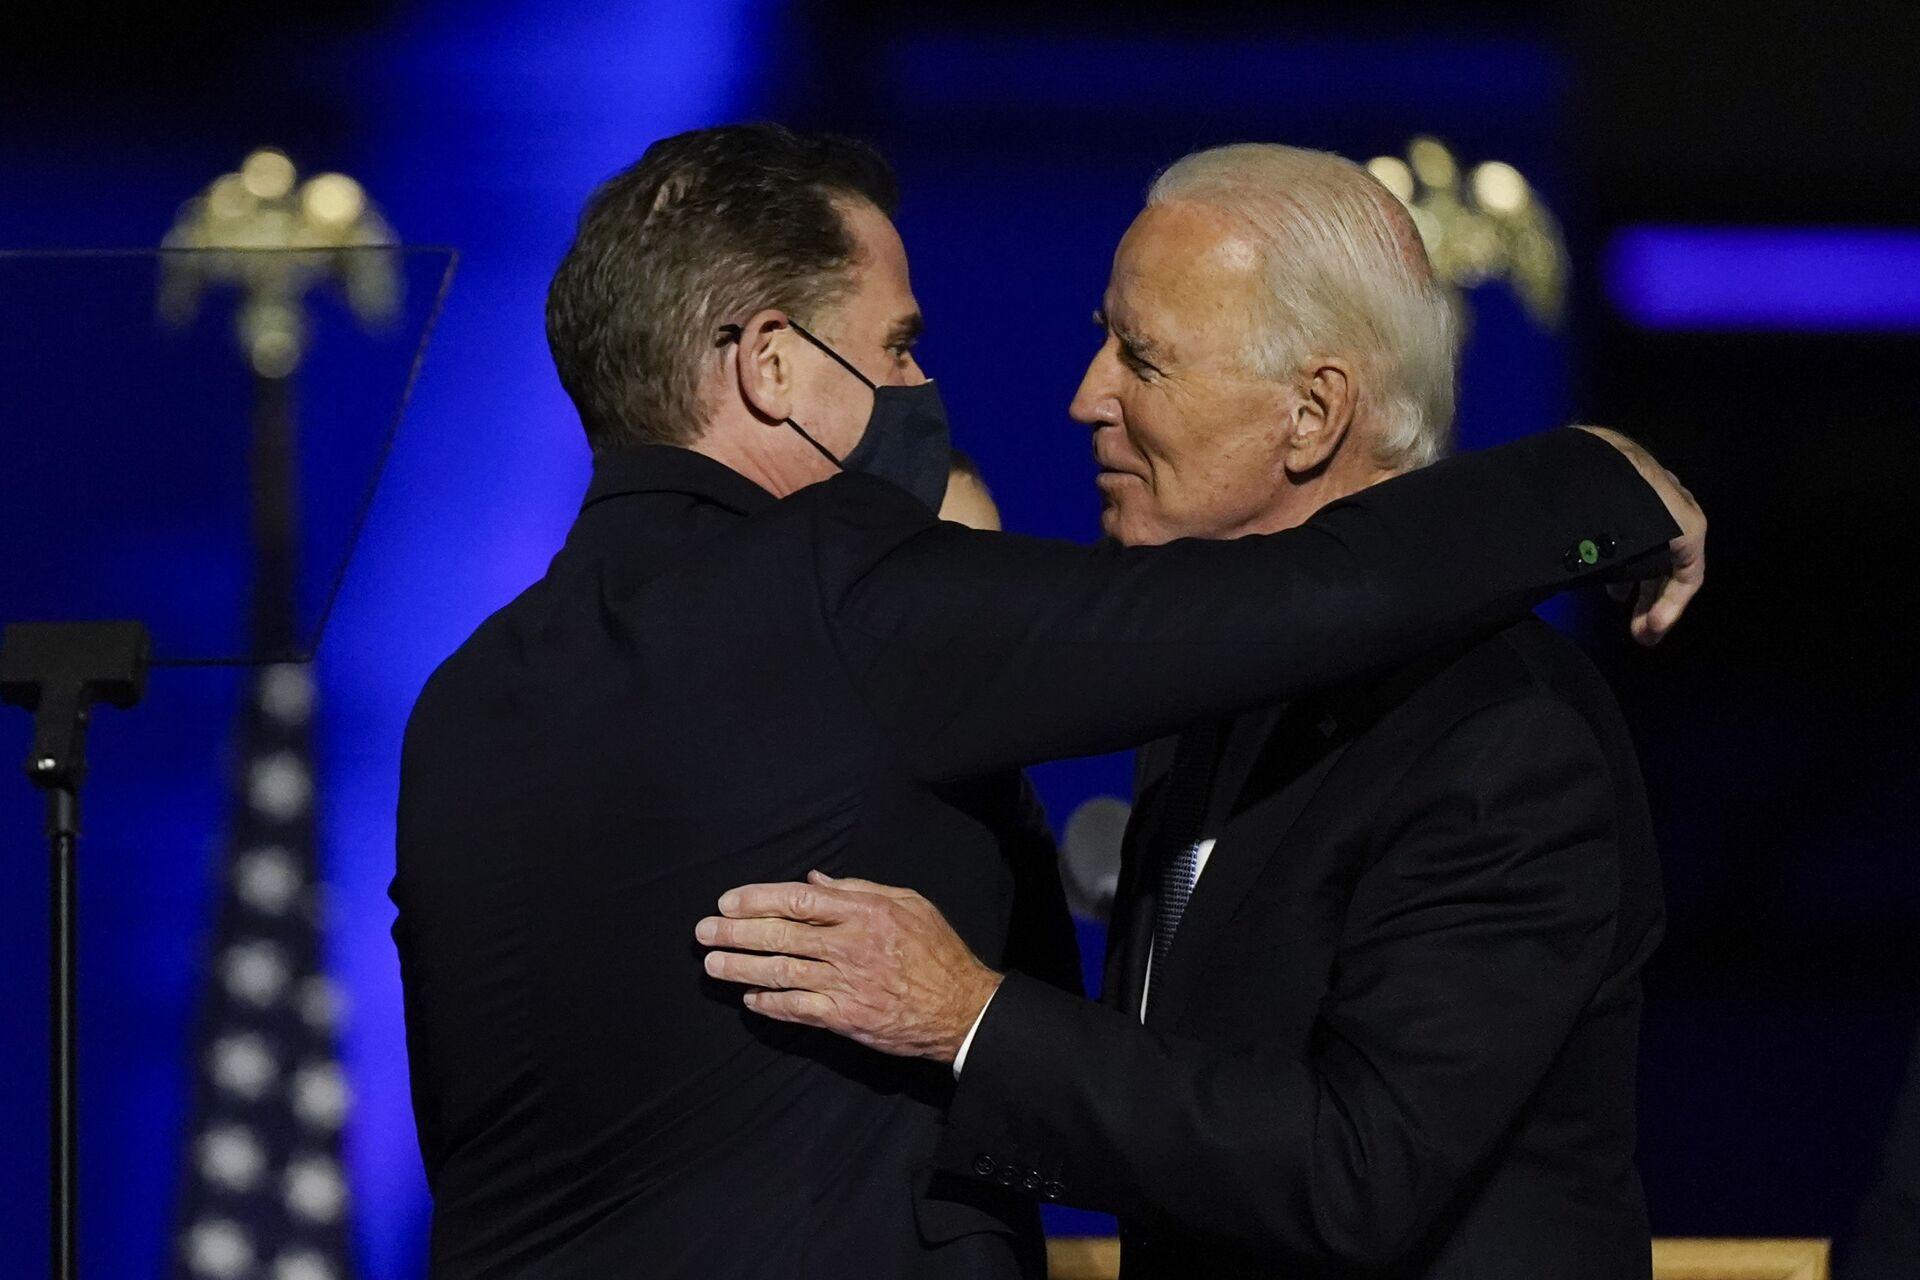 President-elect Joe Biden hugs his son Hunter Biden on stage Saturday, Nov. 7, 2020, in Wilmington, Del - Sputnik International, 1920, 07.09.2021